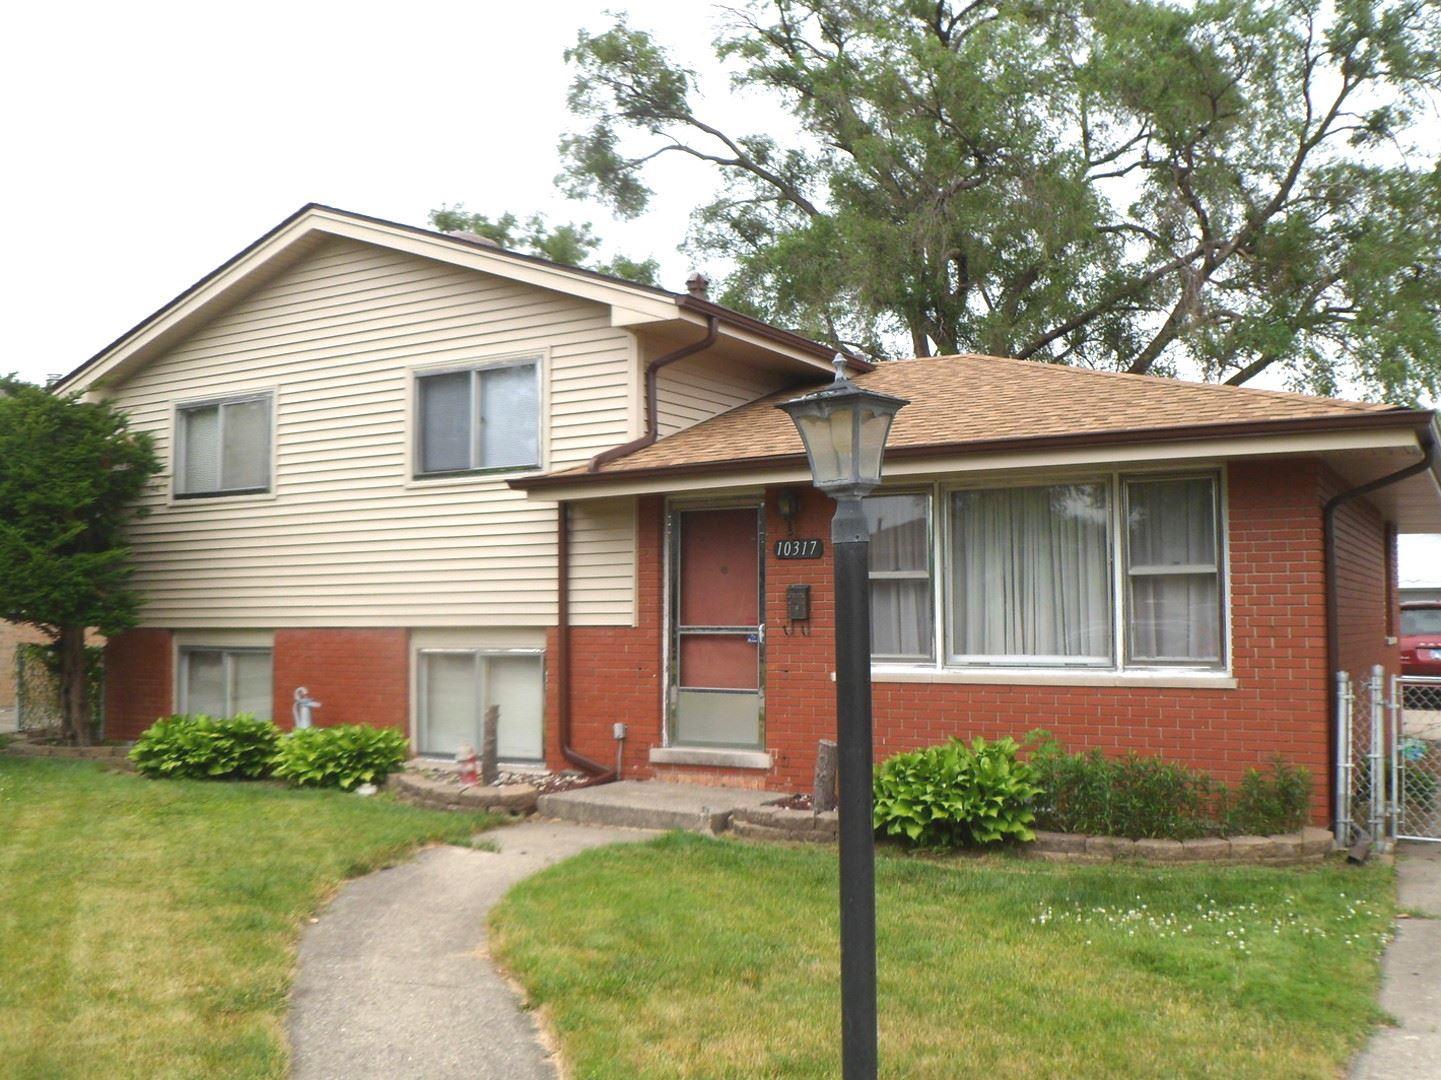 10317 Stephen Drive, Chicago Ridge, IL 60415 - #: 10757995